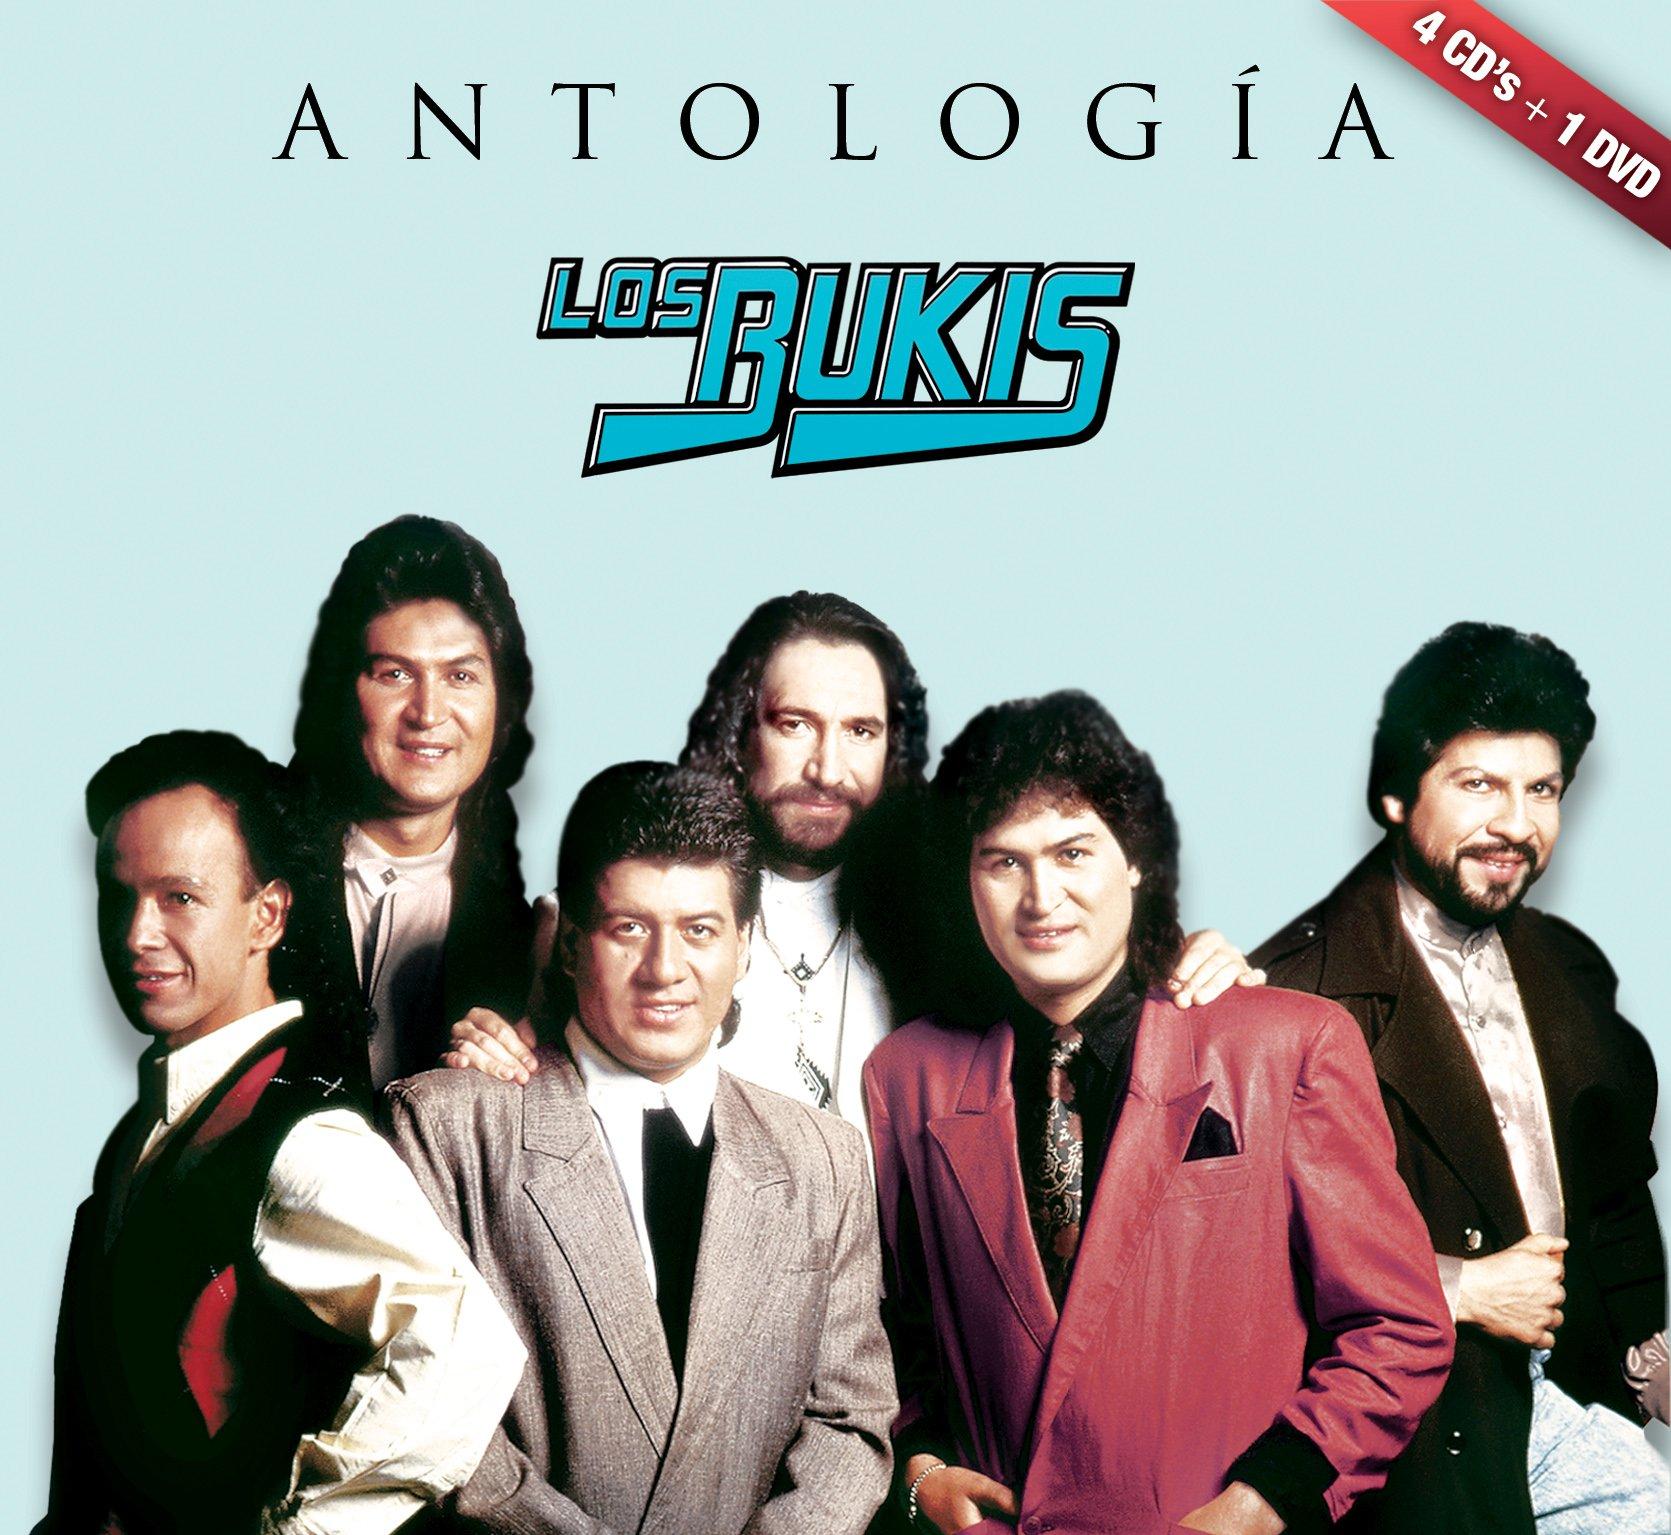 Antologia Musical [4 CD/DVD Combo] by Fonovisa